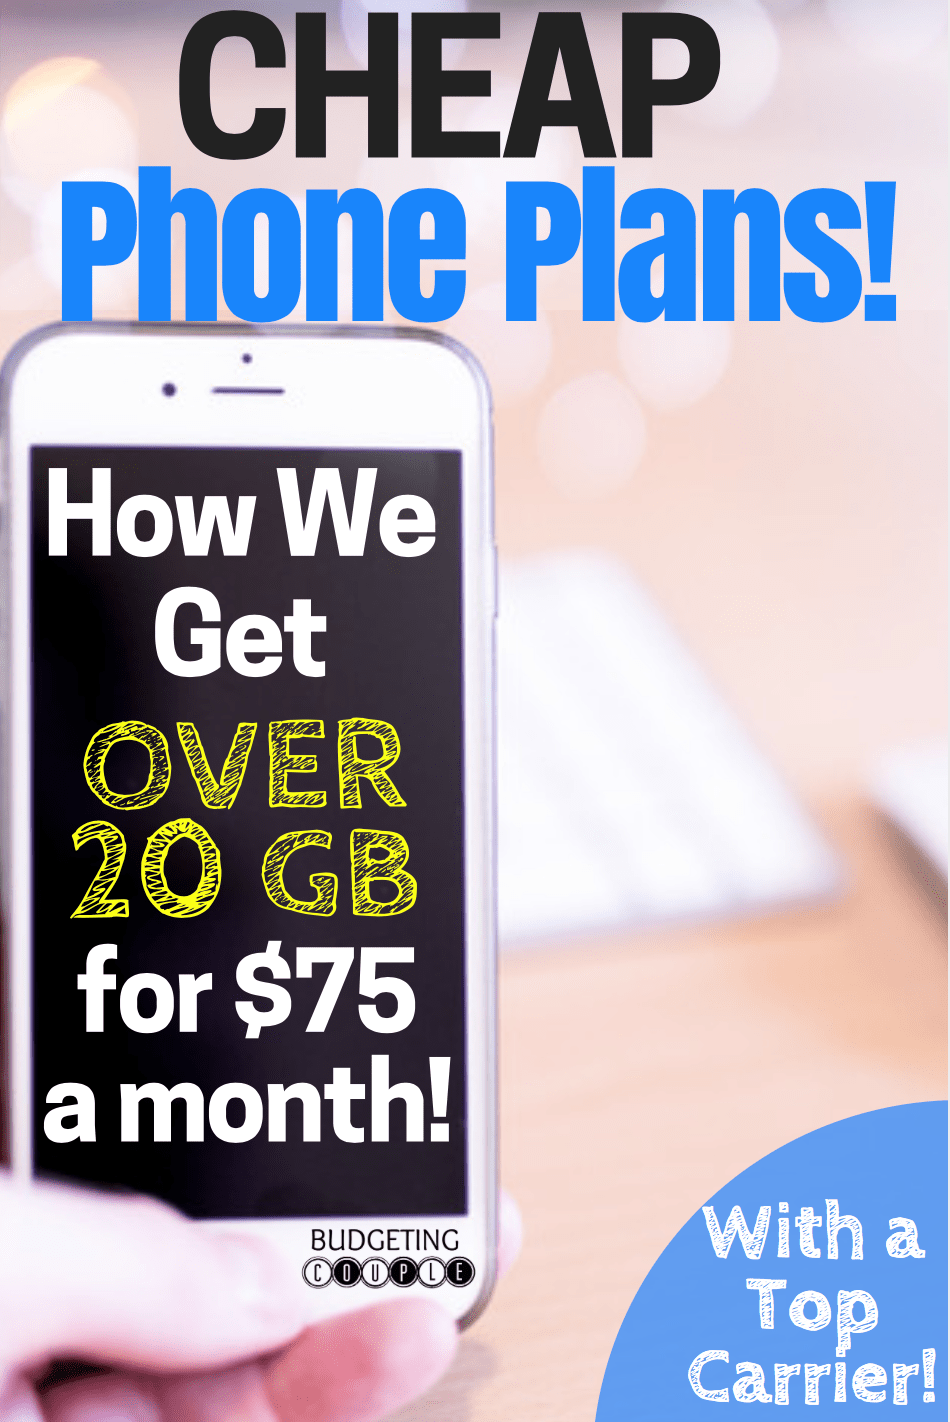 cheap cell phone plans, cheap phone plans, budget phone plans, budget data plans